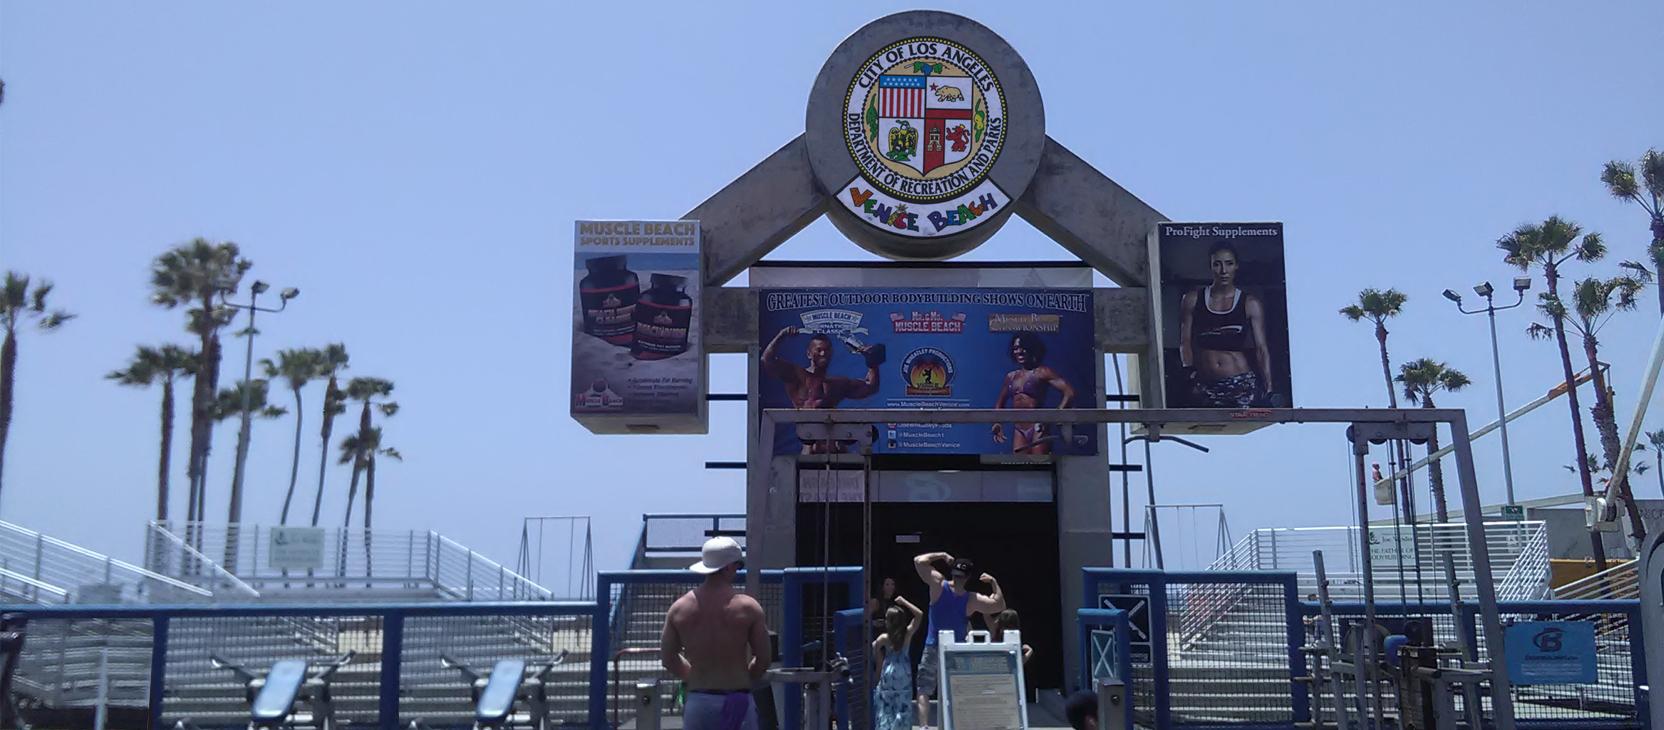 Muscle Beach Venice Outdoor Gym